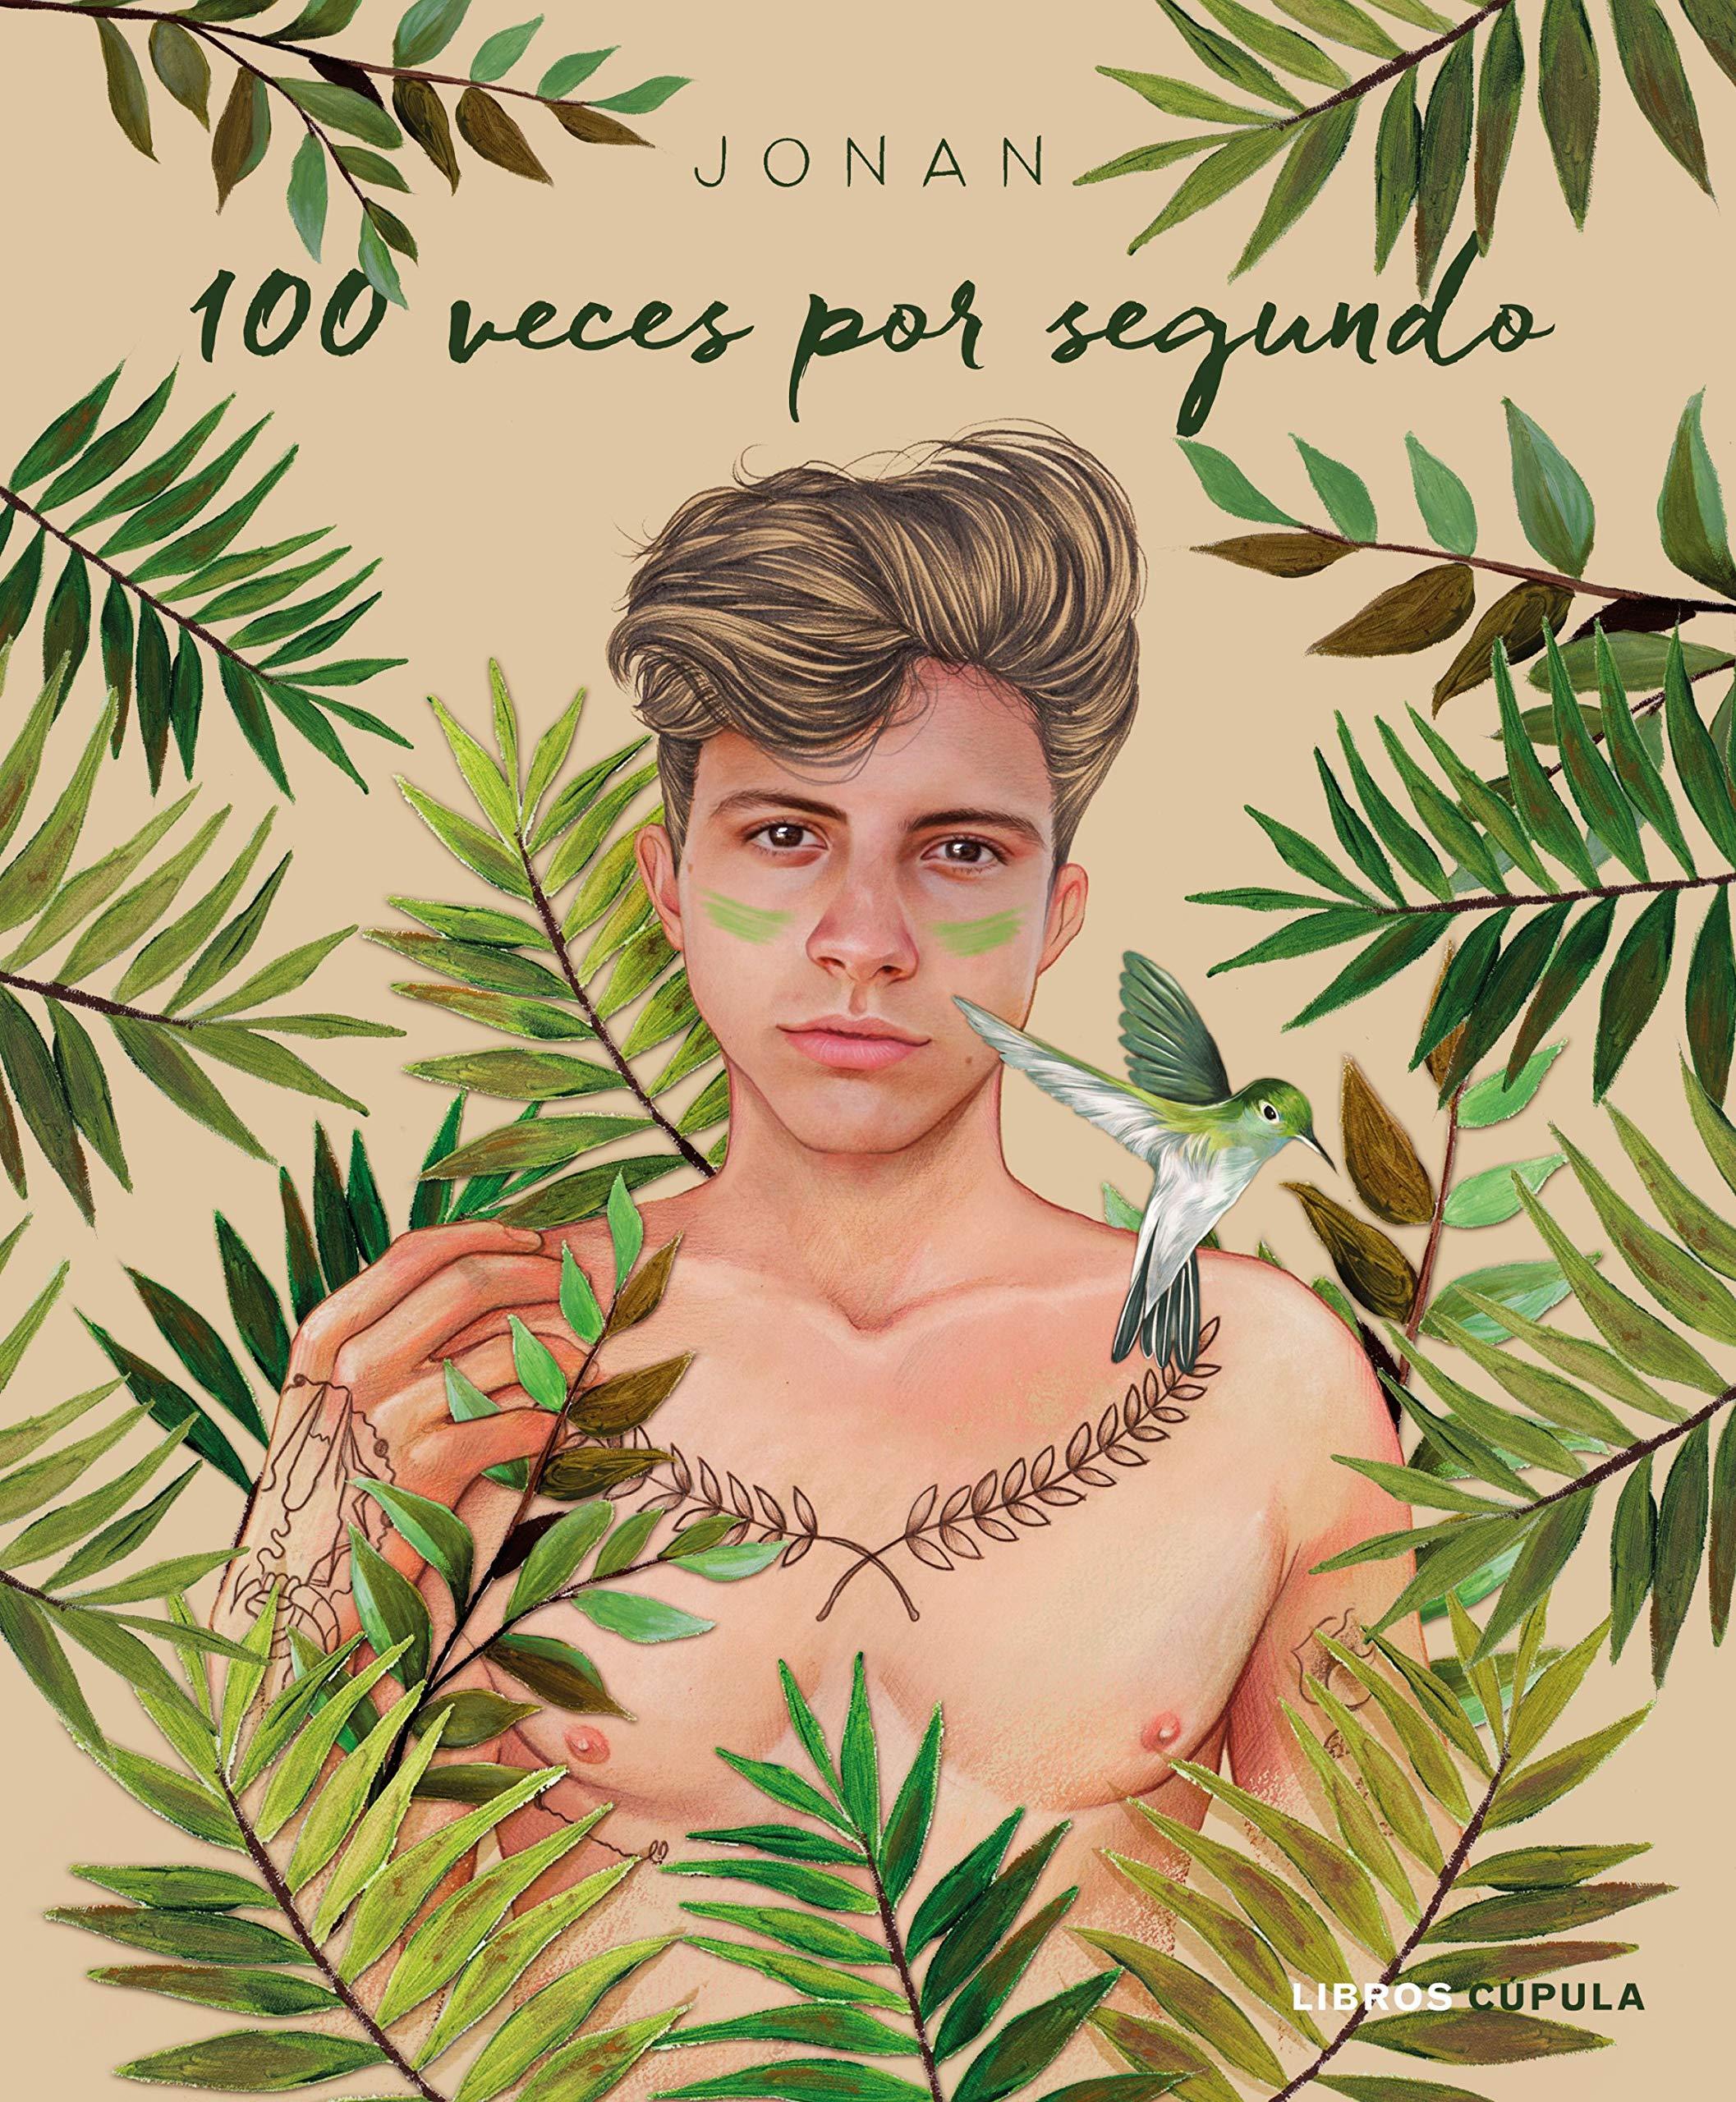 100 veces por segundo (Hobbies): Amazon.es: Jonan: Libros